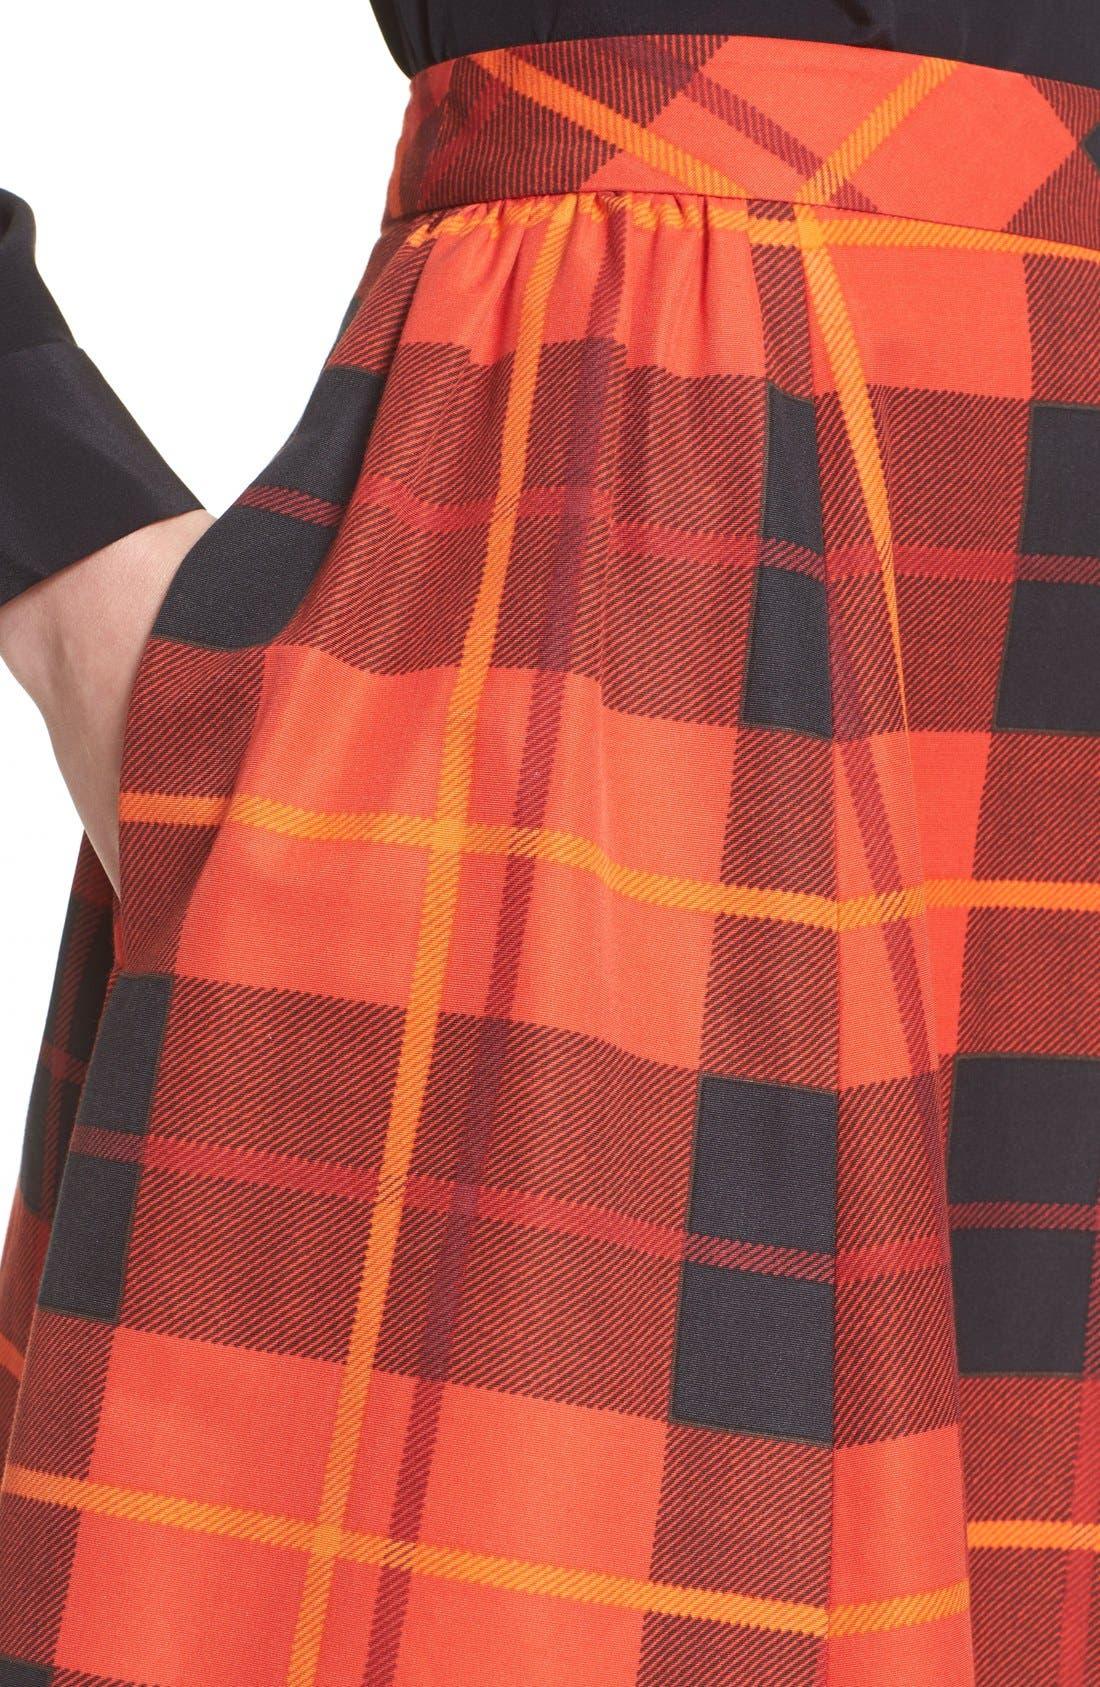 KATE SPADE NEW YORK,                             katespade new yorkwoodland plaid midi skirt,                             Alternate thumbnail 2, color,                             601